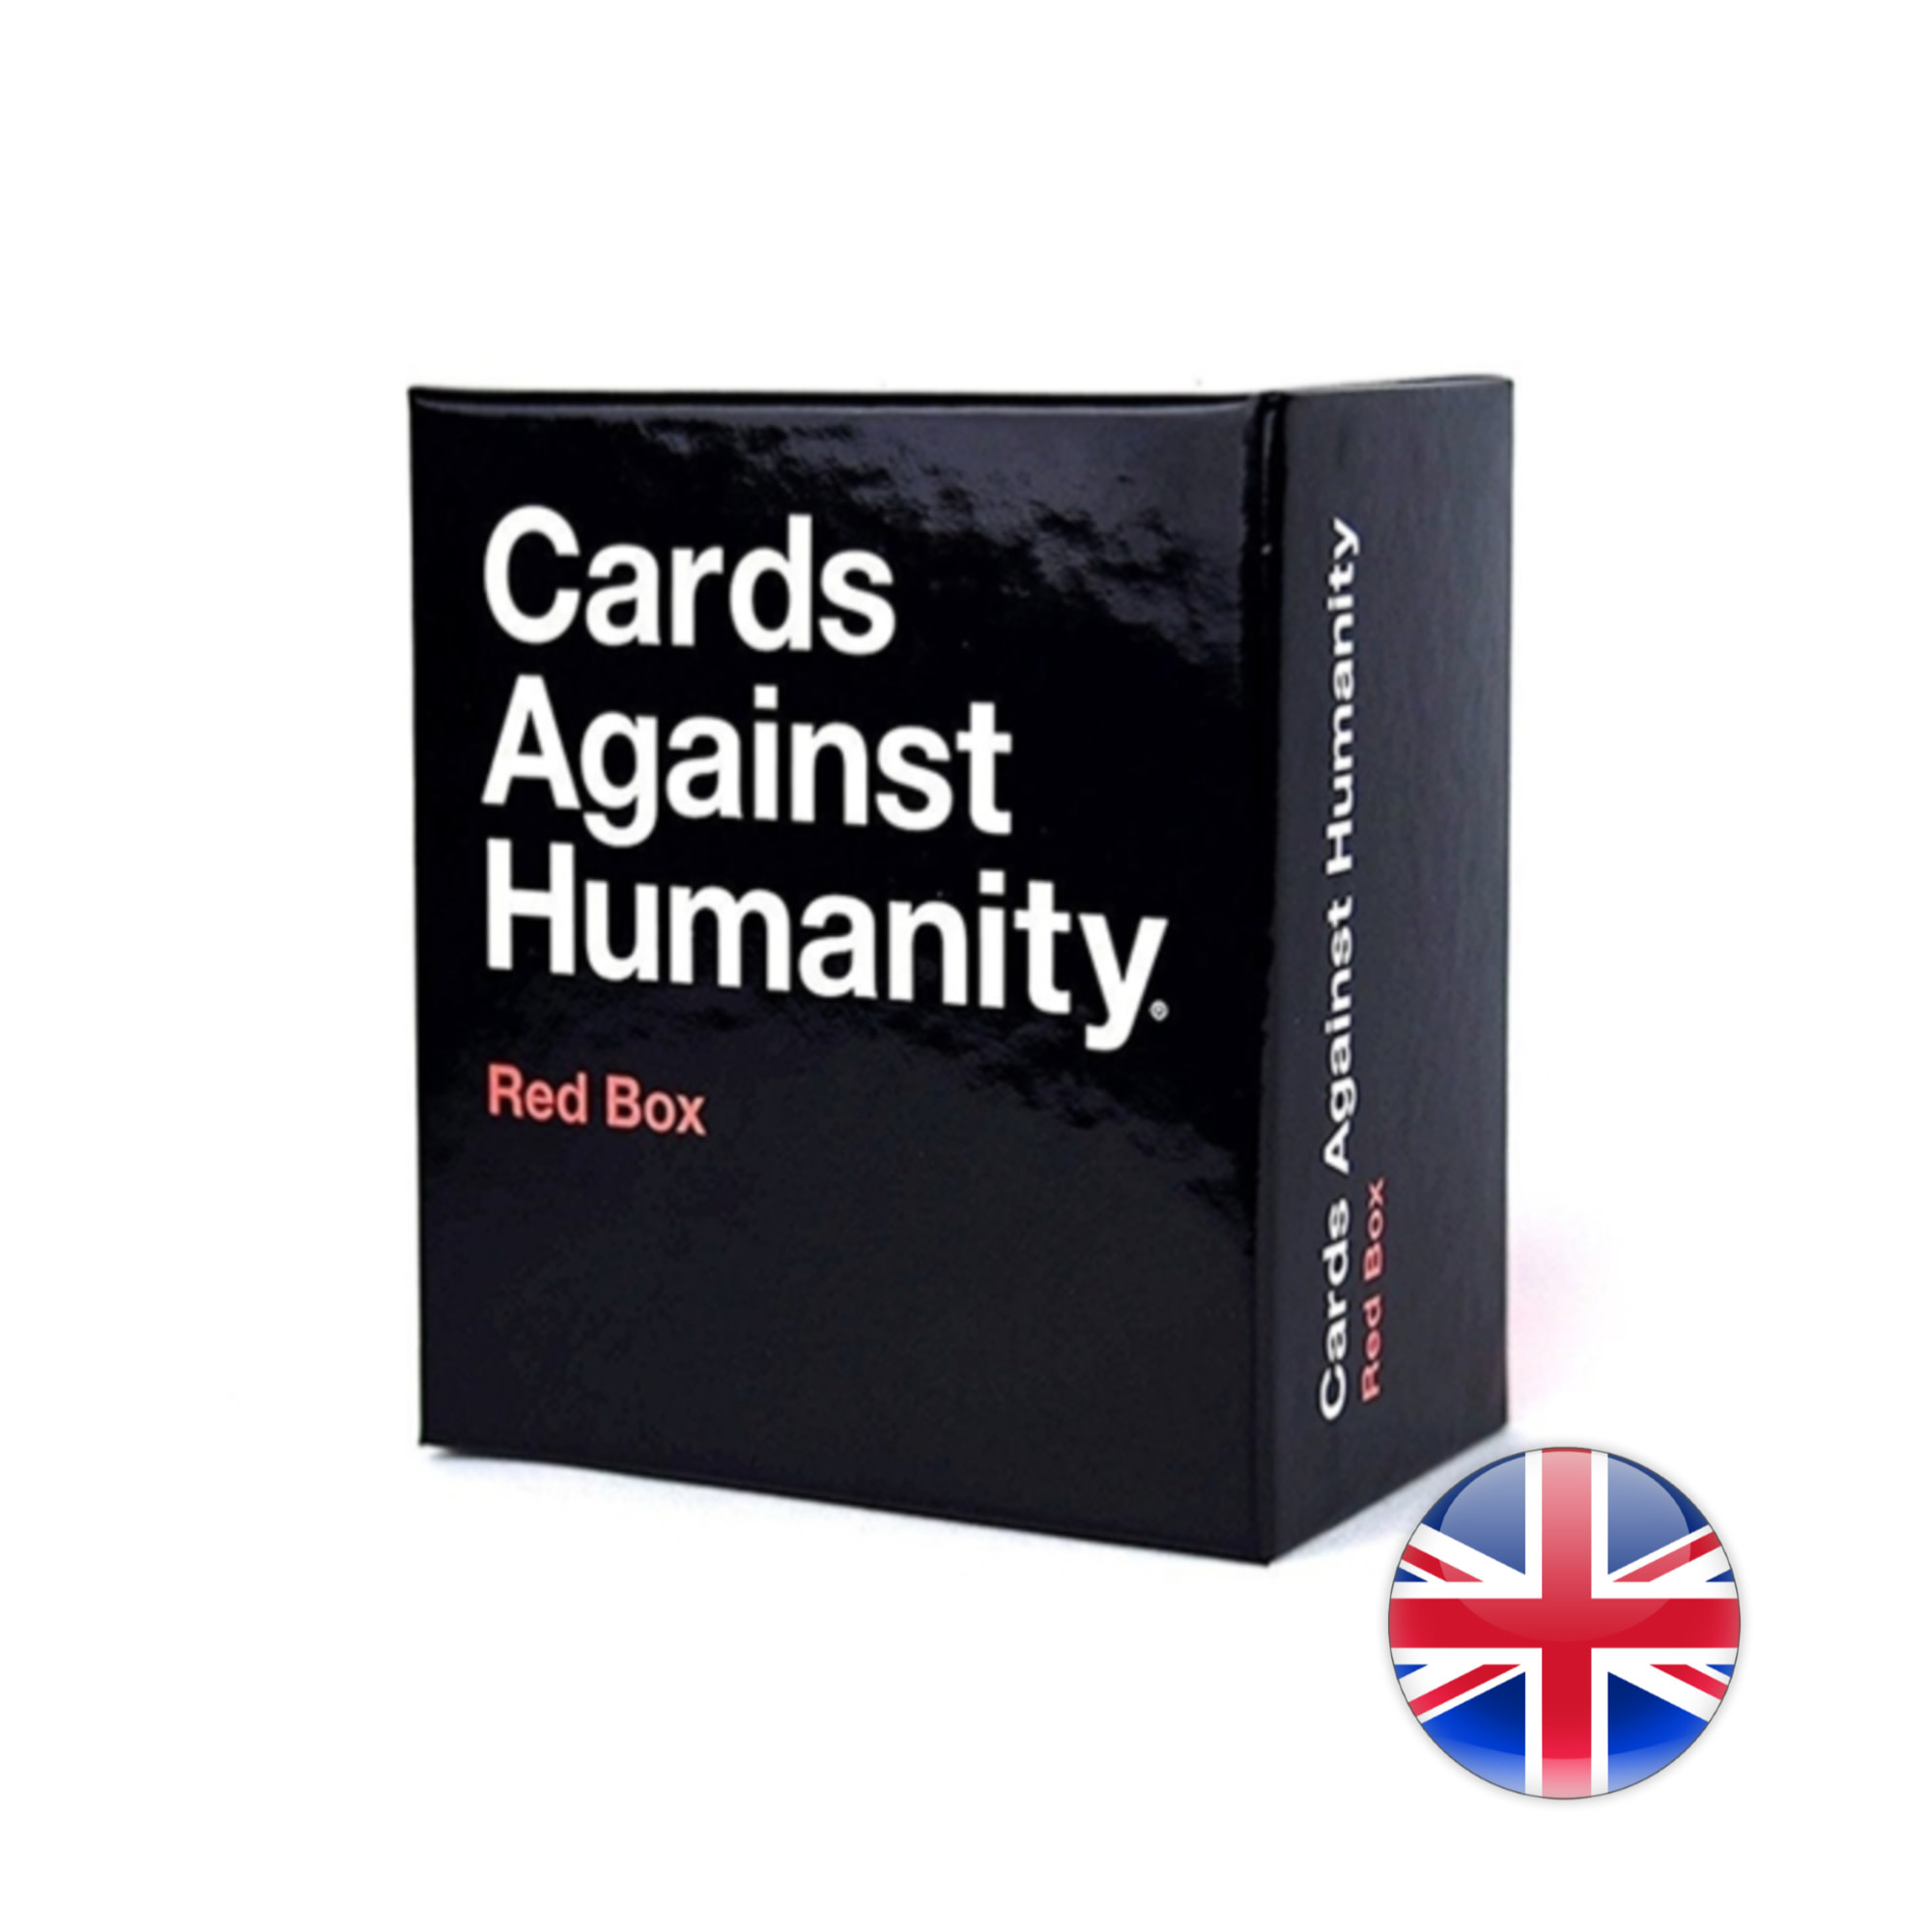 Cards against humanity Cards Against Humanity Red